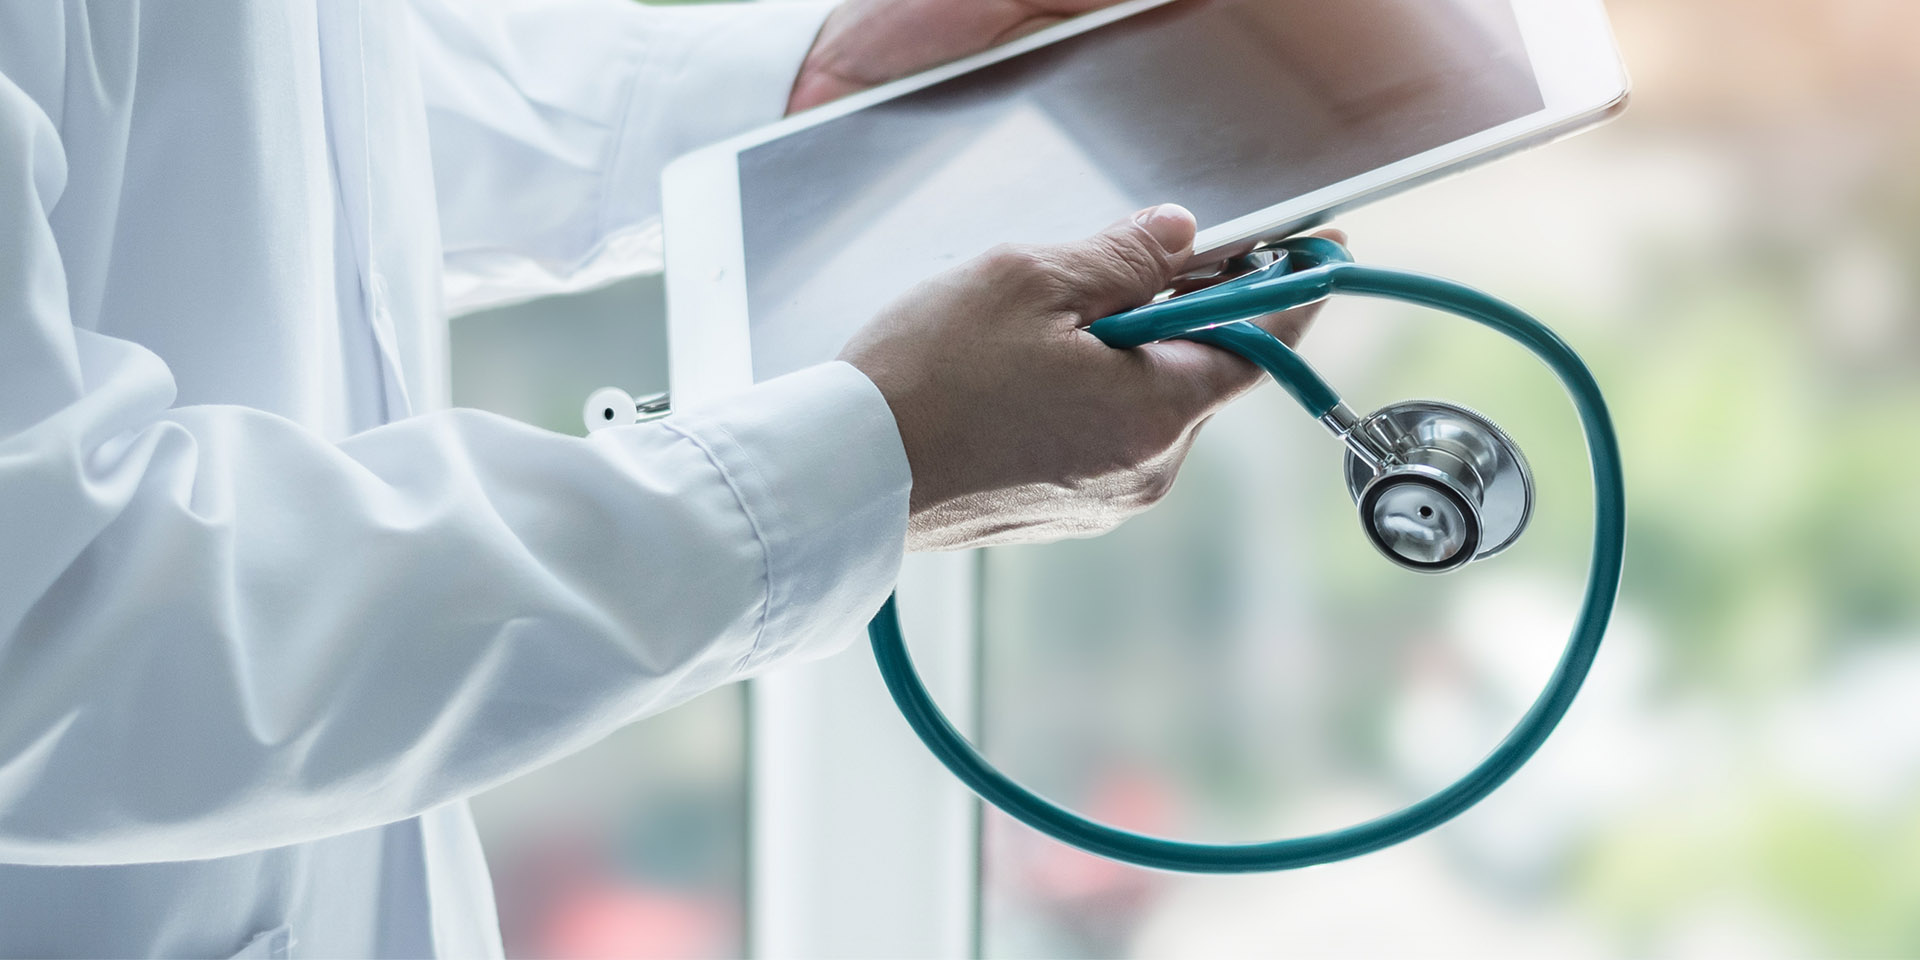 Telemedicine – achieving results despite the challenges